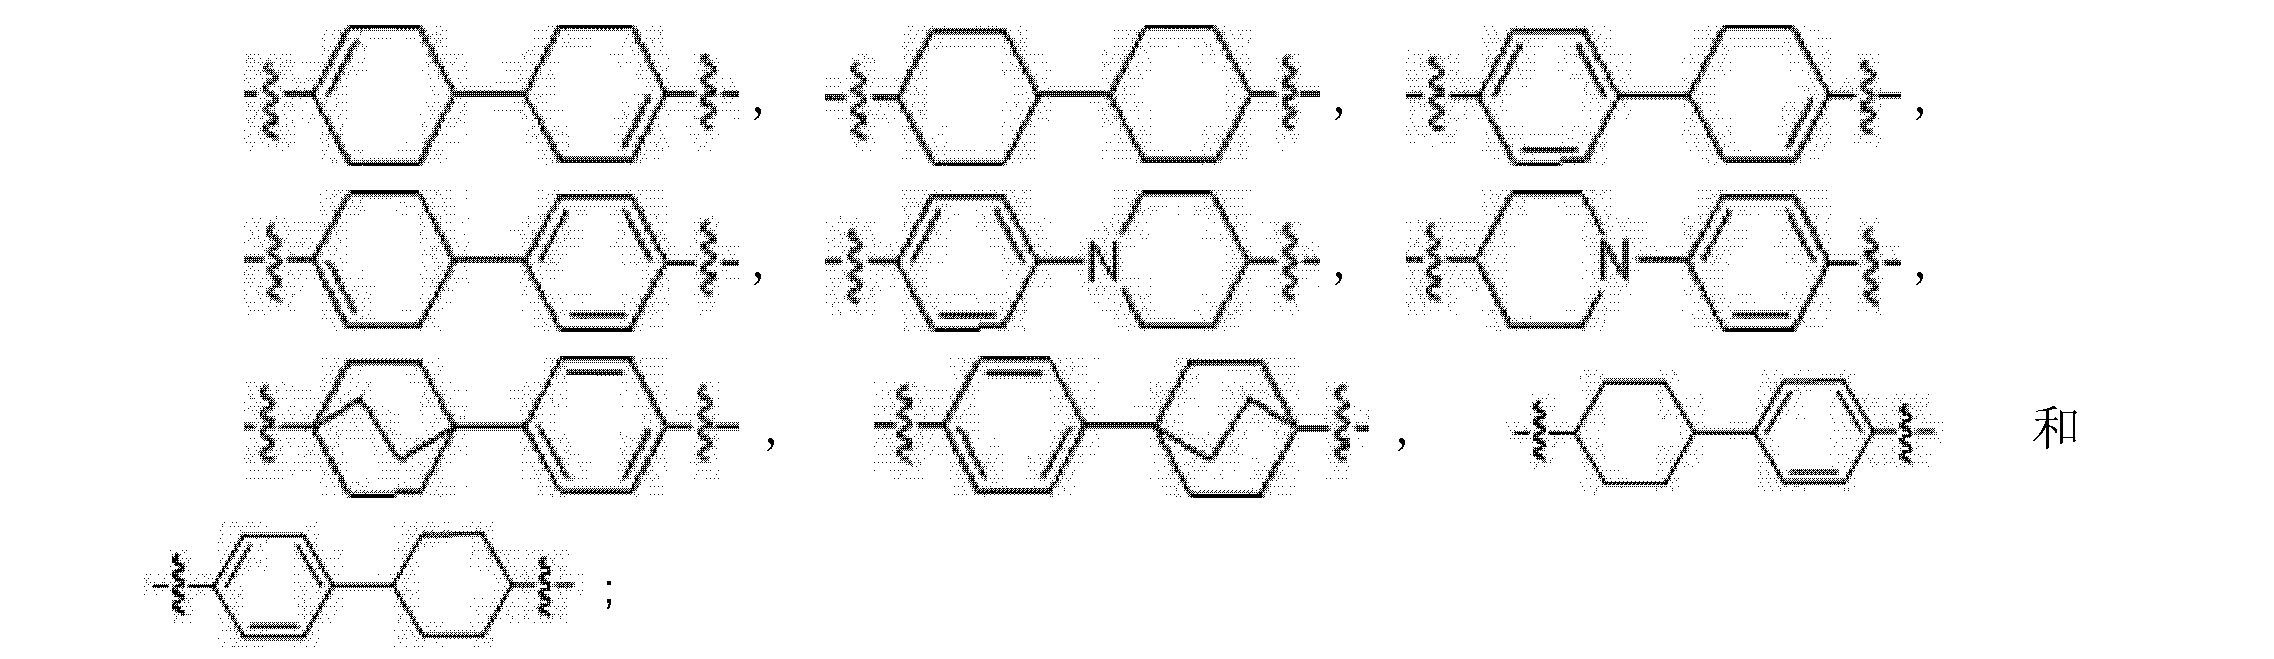 Figure CN102378762AD00141